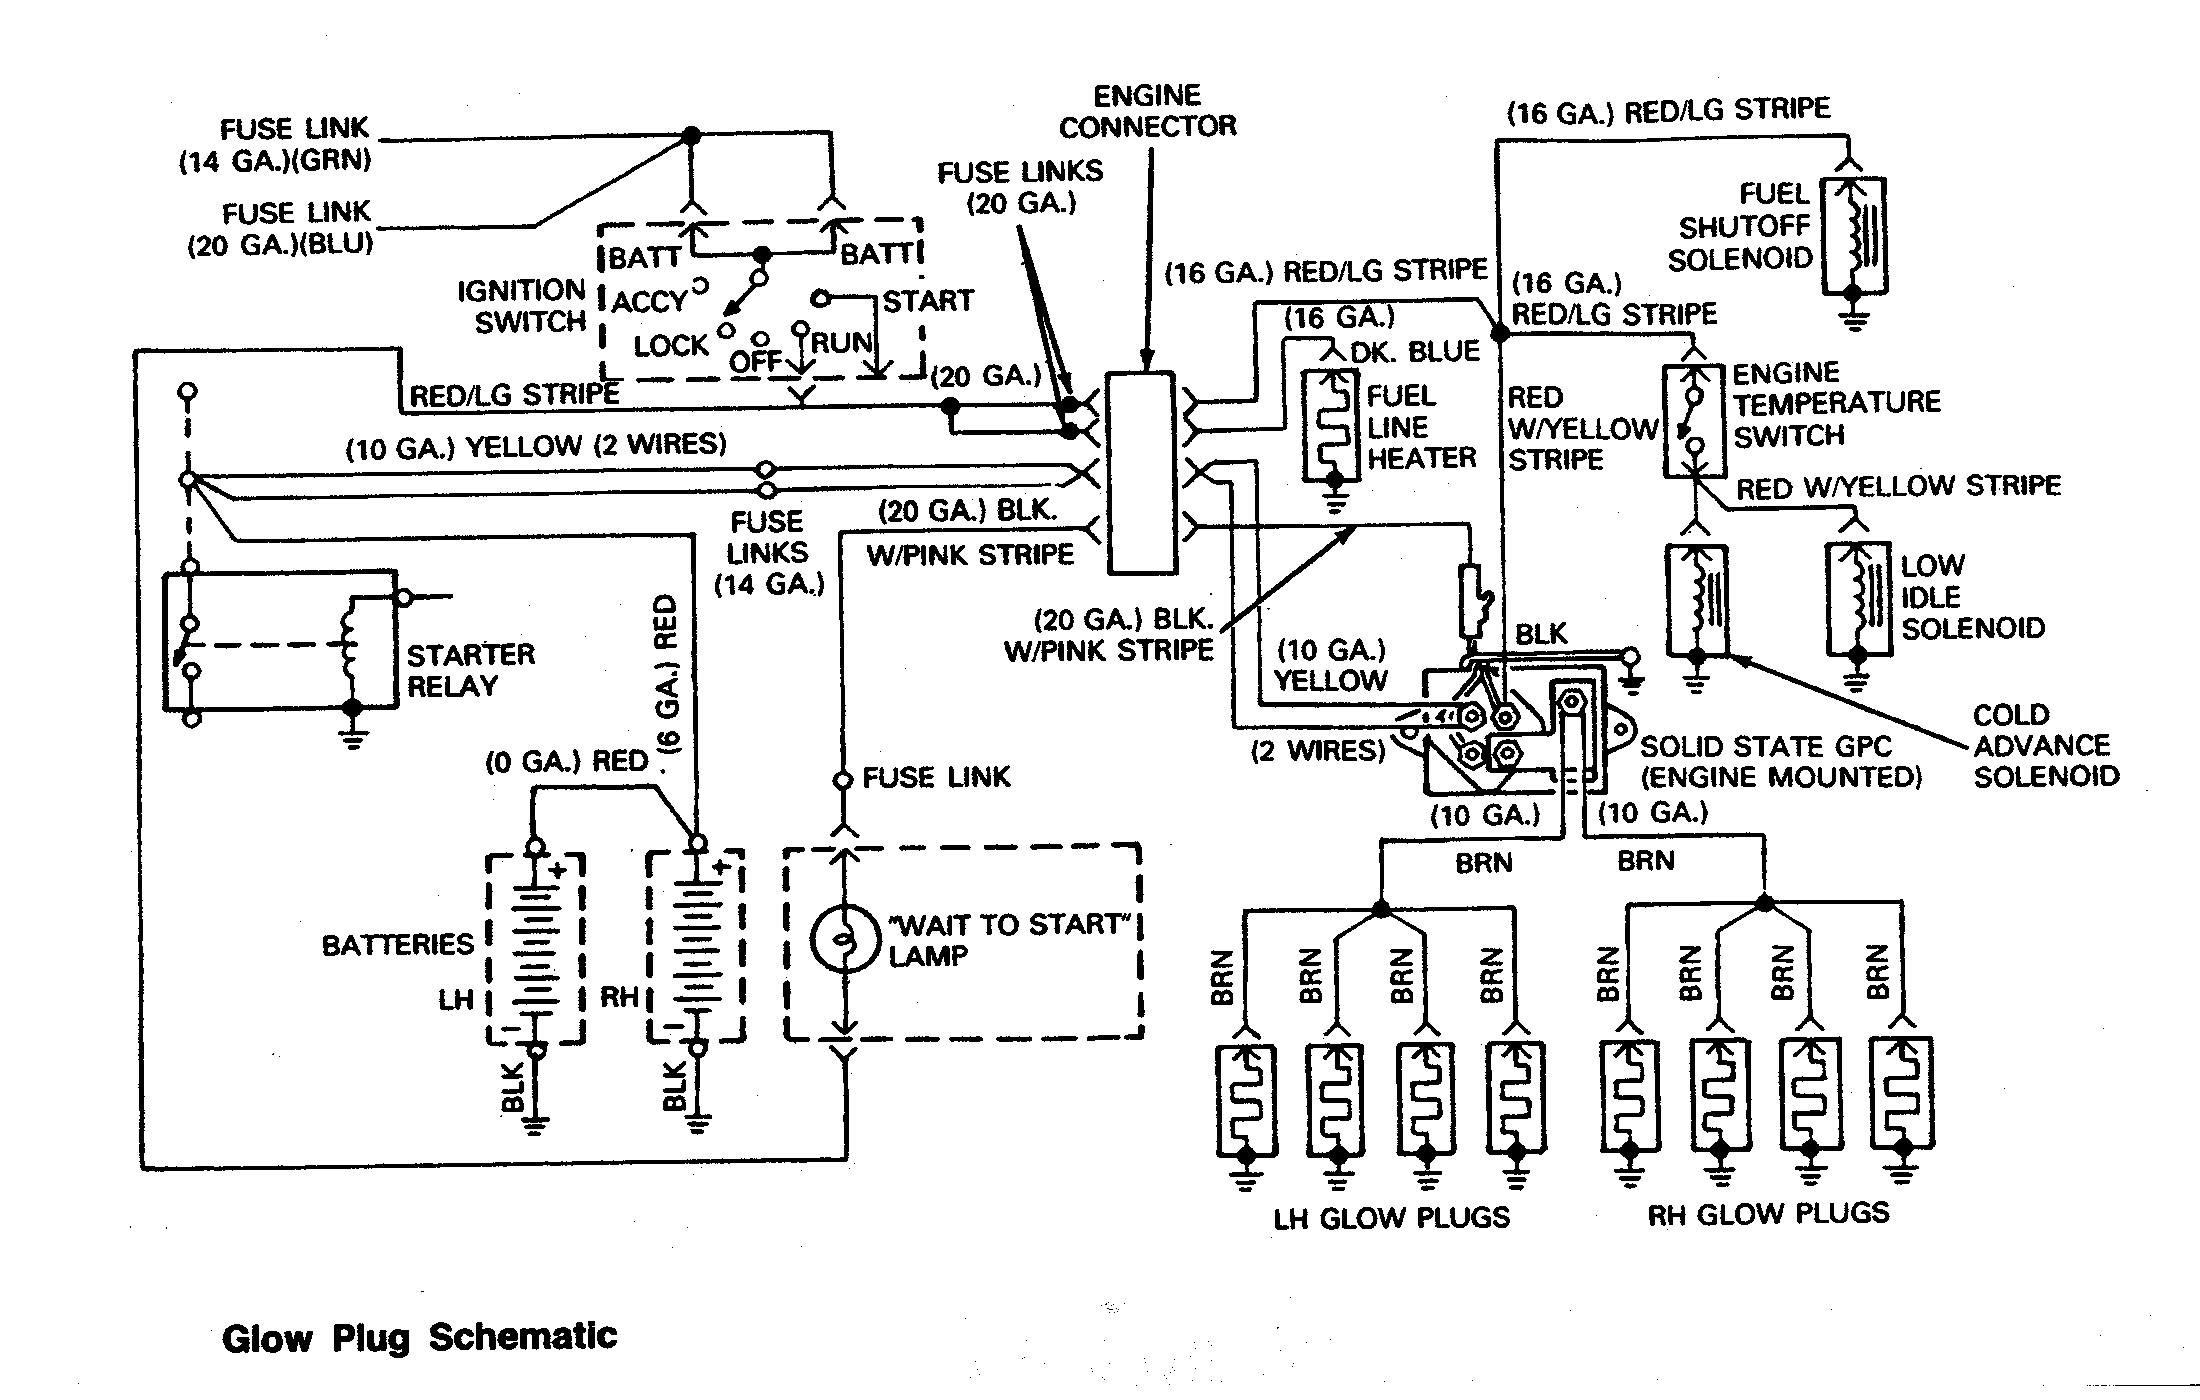 Diagram Of Engine Parts Glow Engine Diagram Experts Wiring Diagram • Of Diagram Of Engine Parts